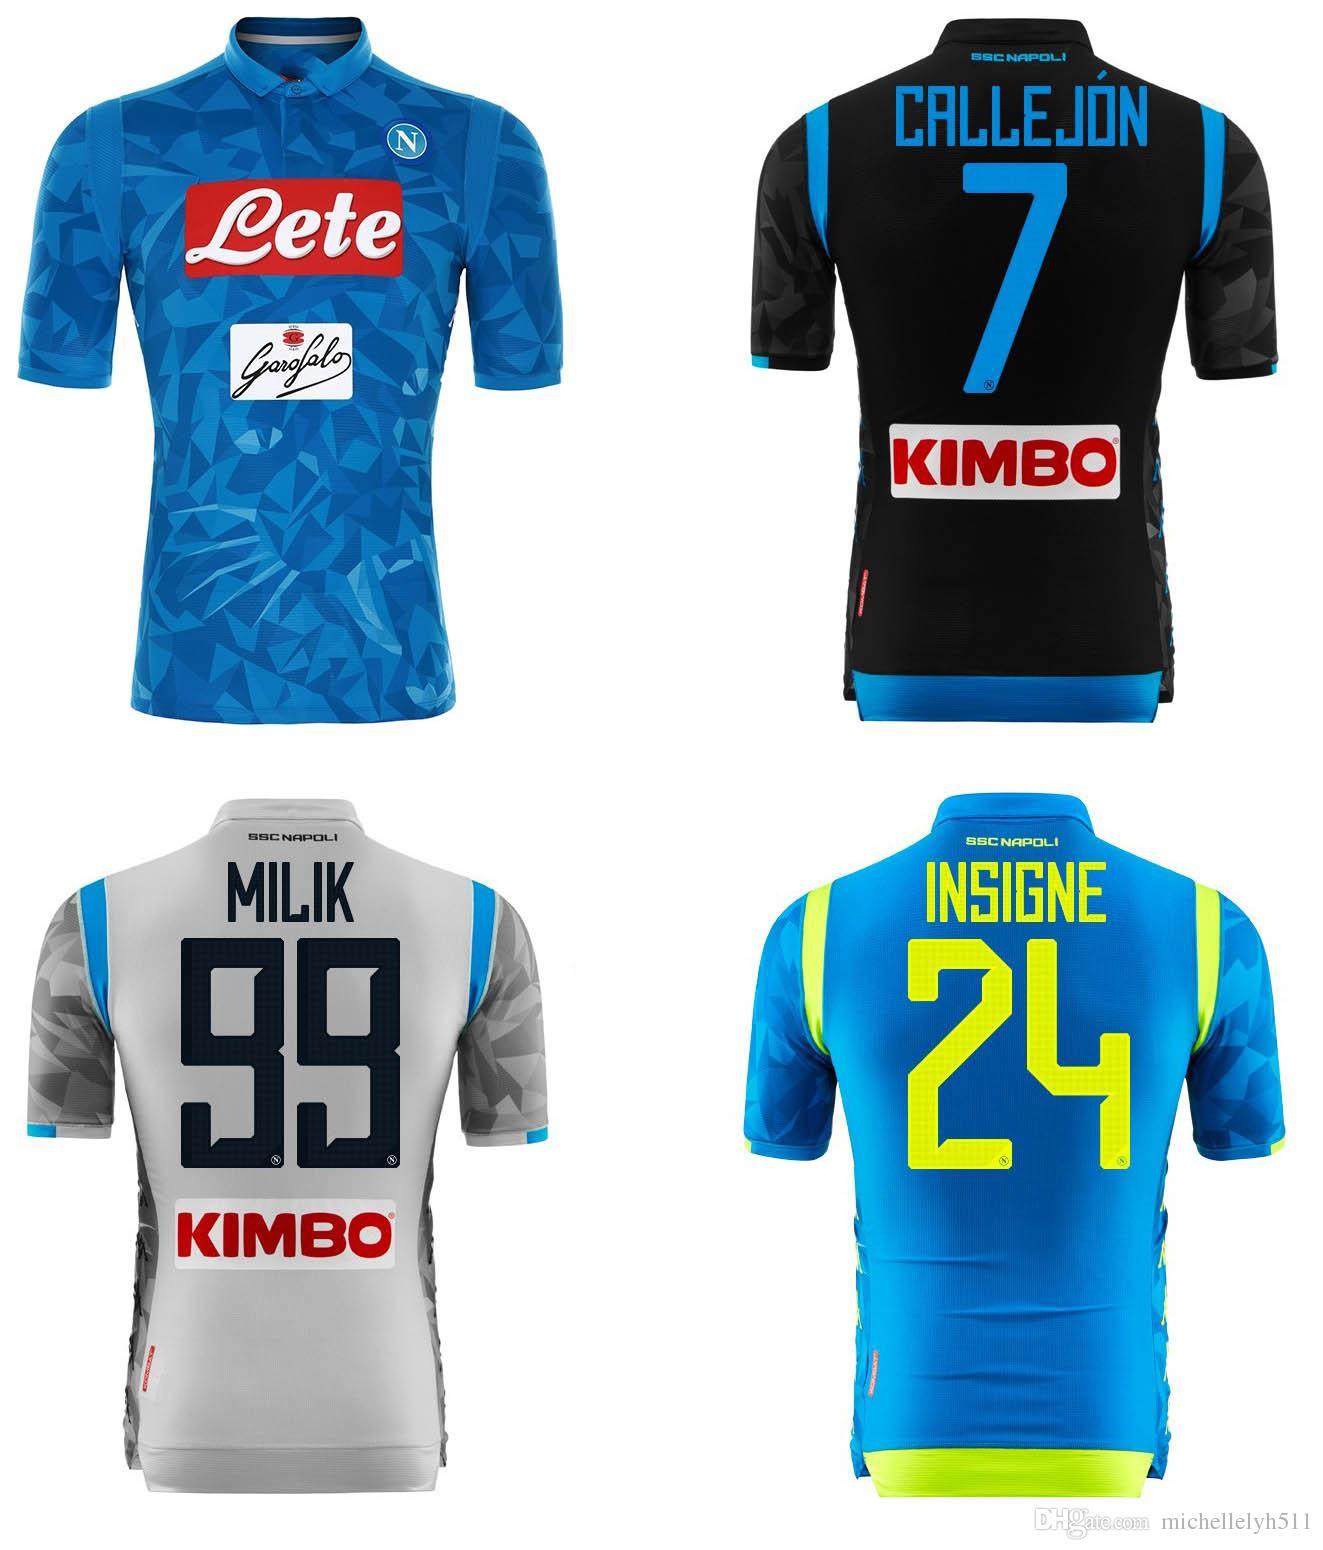 8bb615562a42b 2019 2018 2019 Napoli Soccer Jerseys Naples Home Blue Football Jerseys 18 19  HAMSIK L.INSIGNE PLAYER MERTENS Football Shirts Sport Uniforms From ...